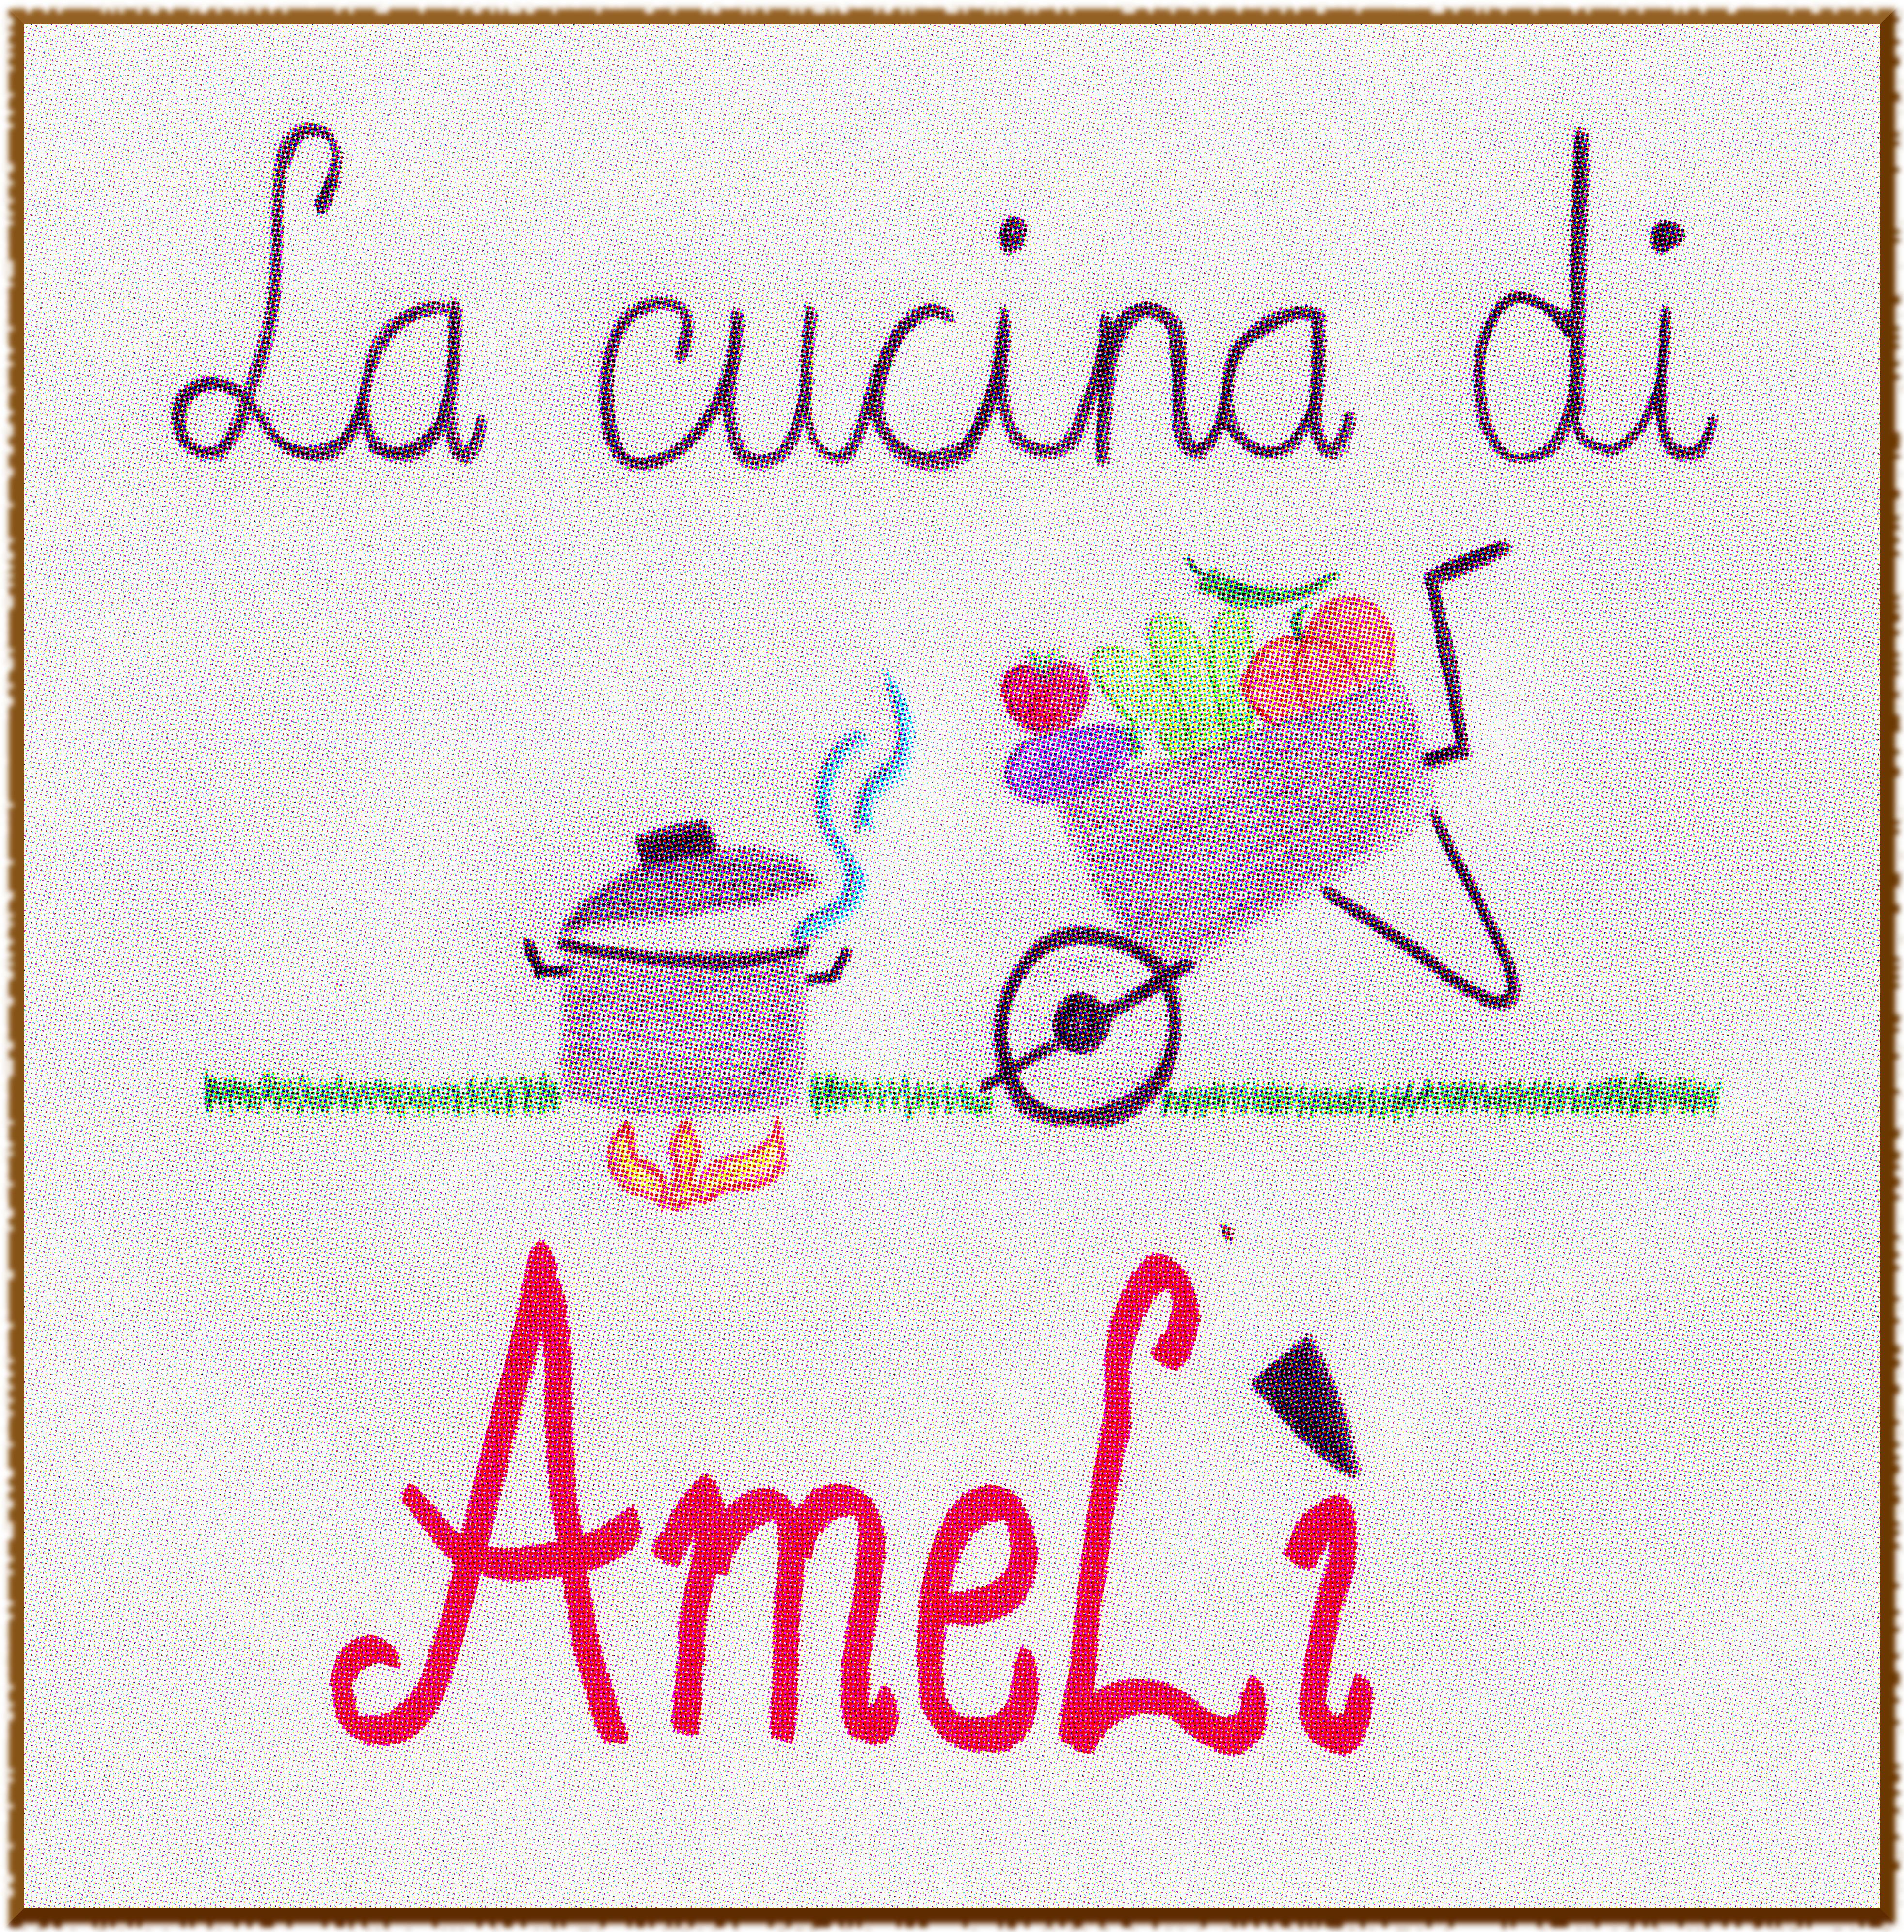 Logo Amelì bordo frastagliato